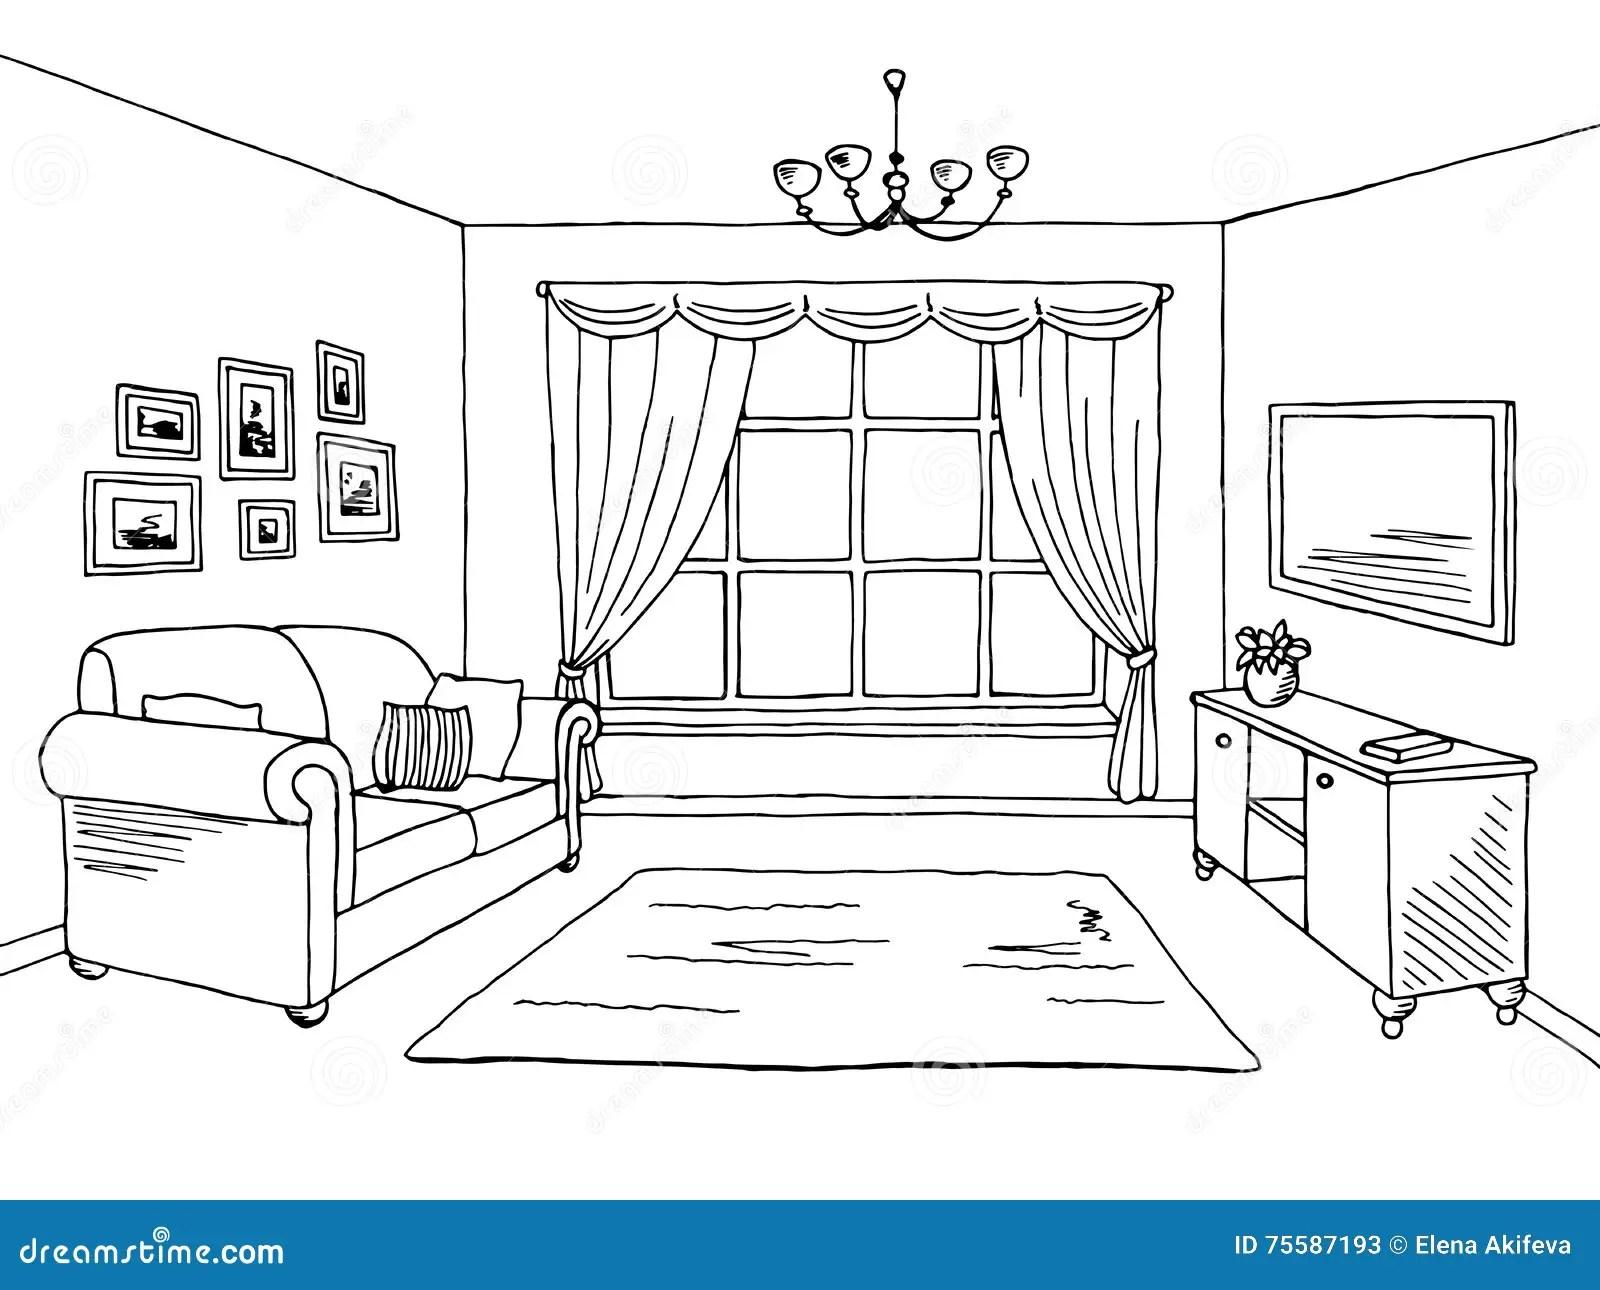 Living Room Graphic Black White Interior Sketch Illustration Stock Vector  Illustration of hand